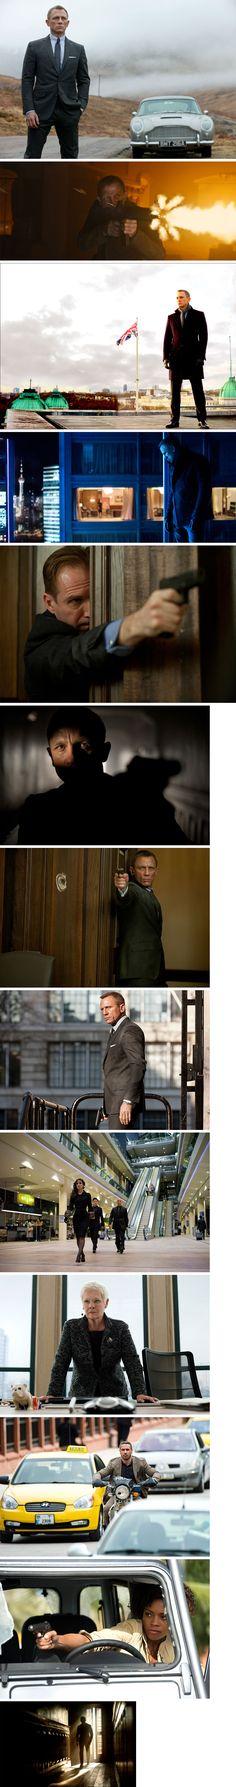 "Scenes from the James Bond movie, ""Skyfall. Javier Bardem, Skyfall, Movie Photo, I Movie, Daniel Craig James Bond, Red Dead Redemption Ii, Best Bond, Why I Love Him, Music Tv"